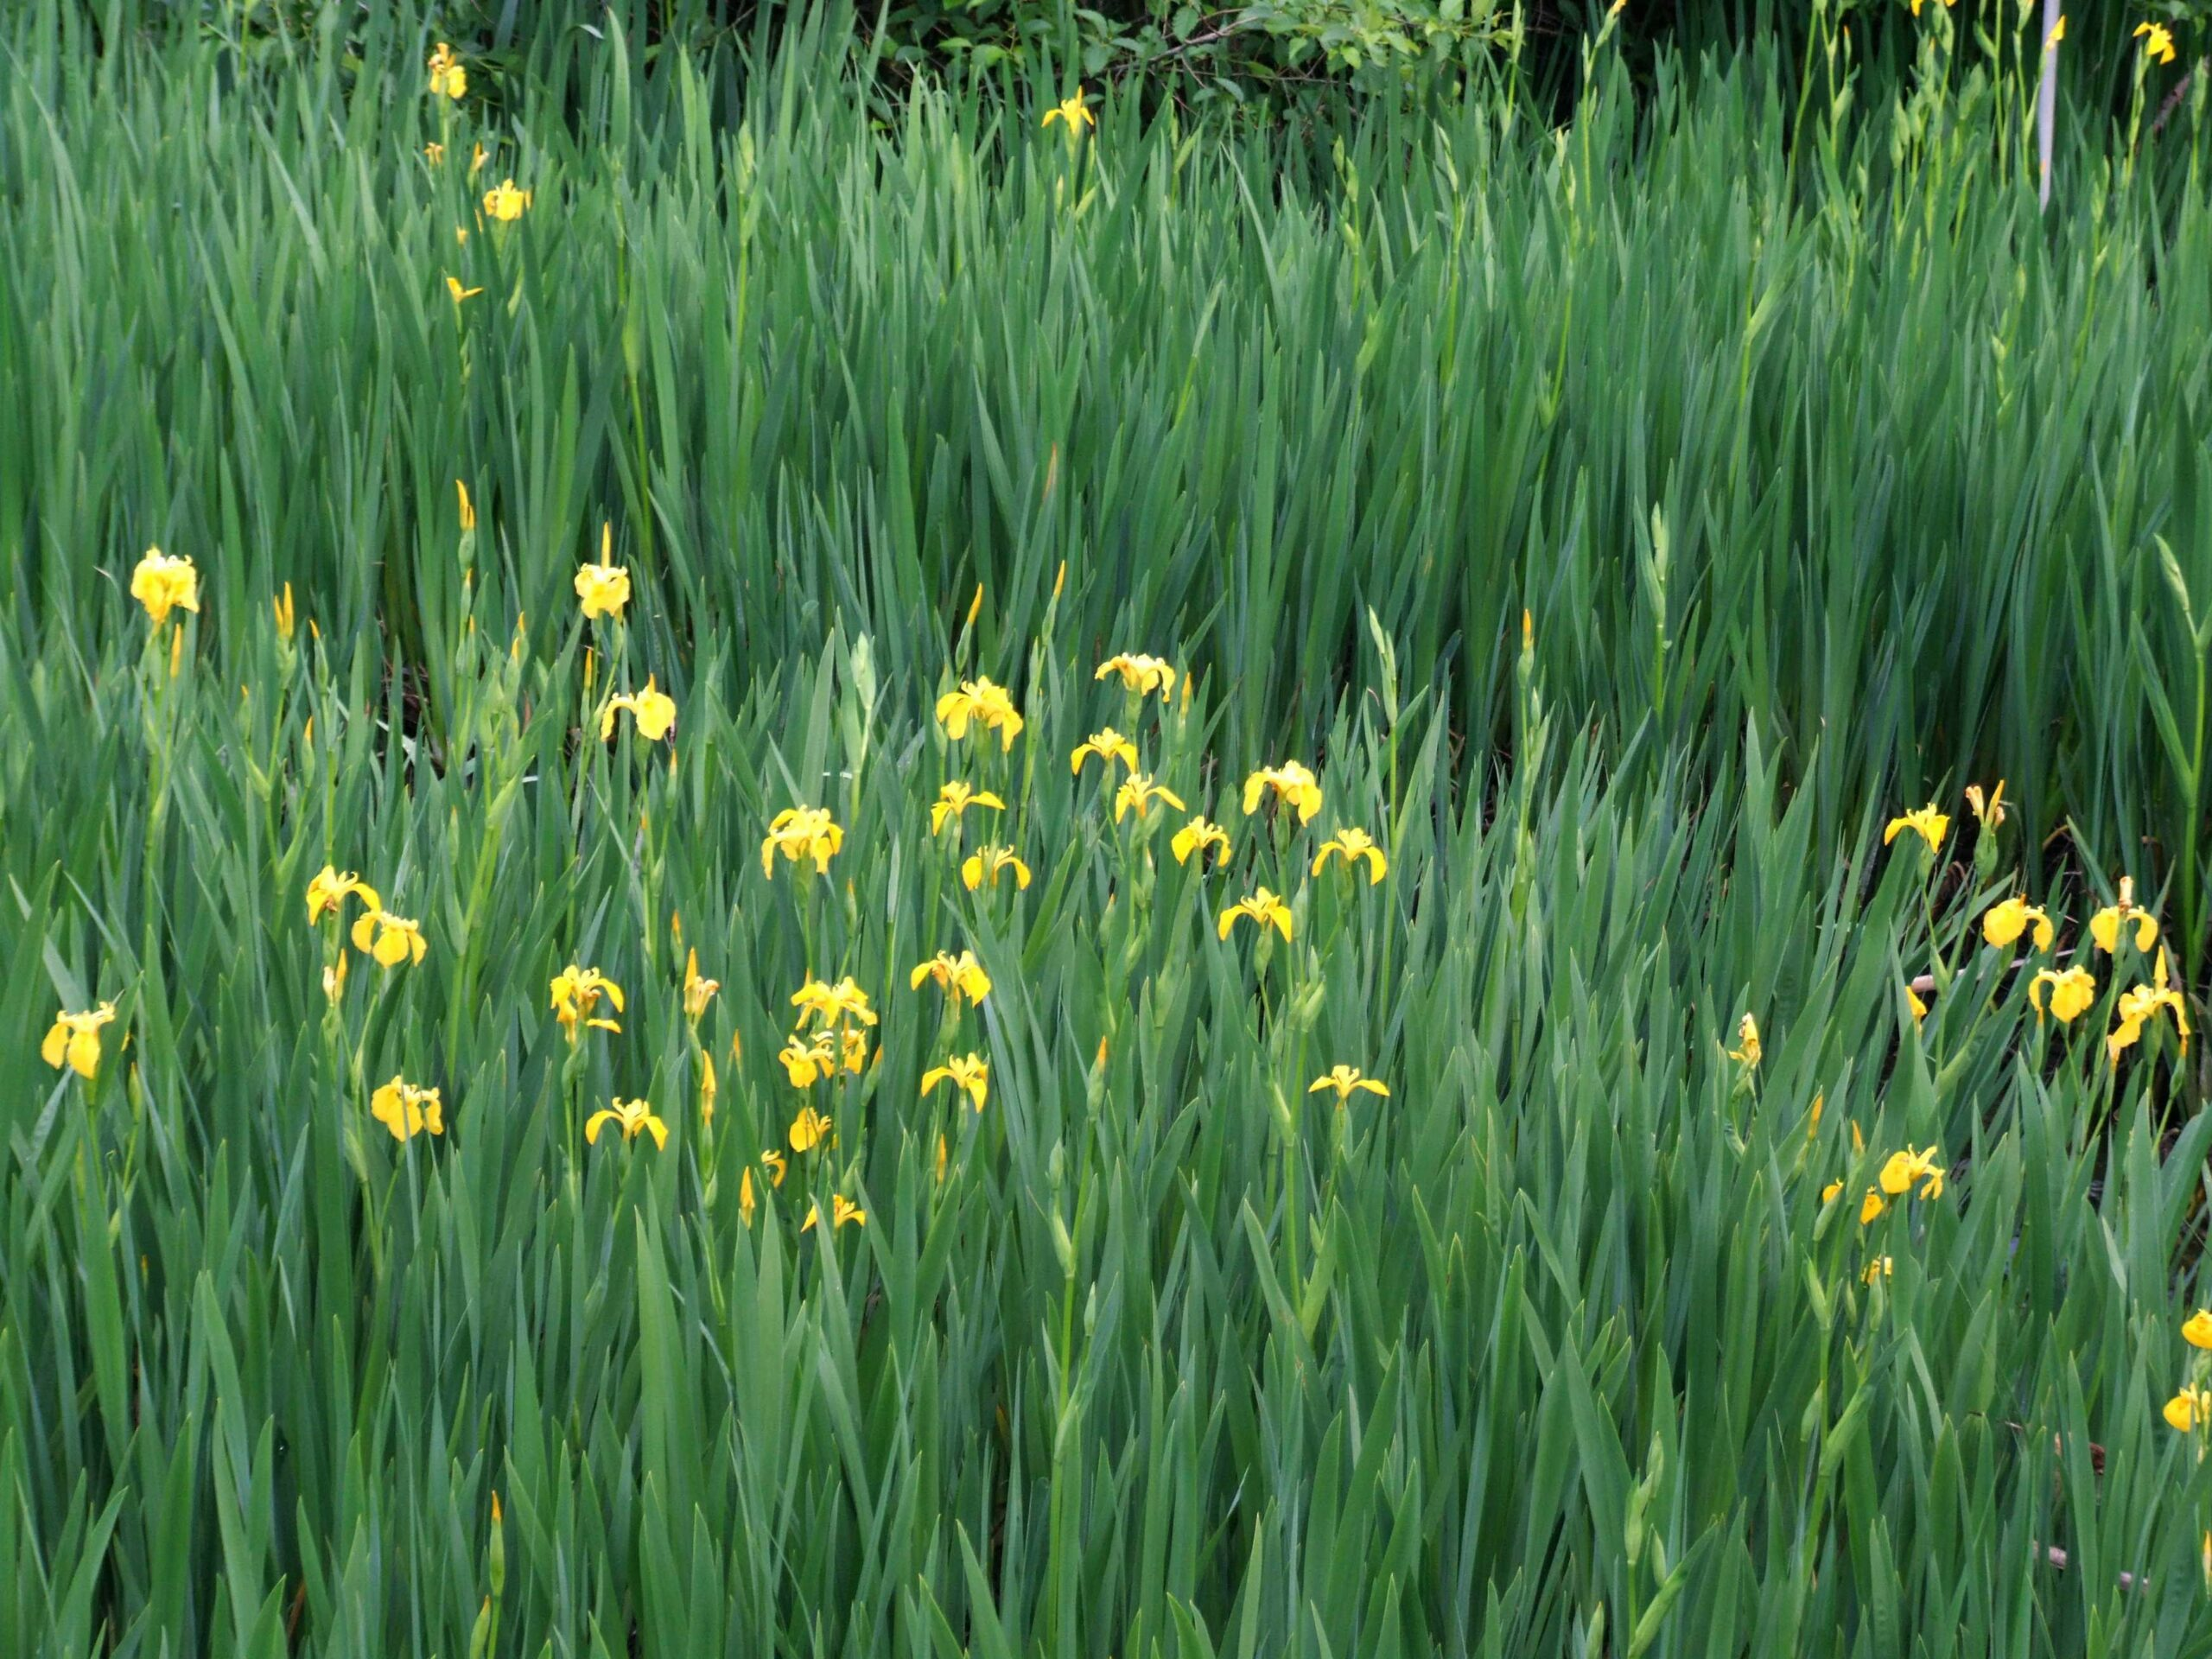 Iris pseudacorus_yellowflag iris_Bob Case_cropped